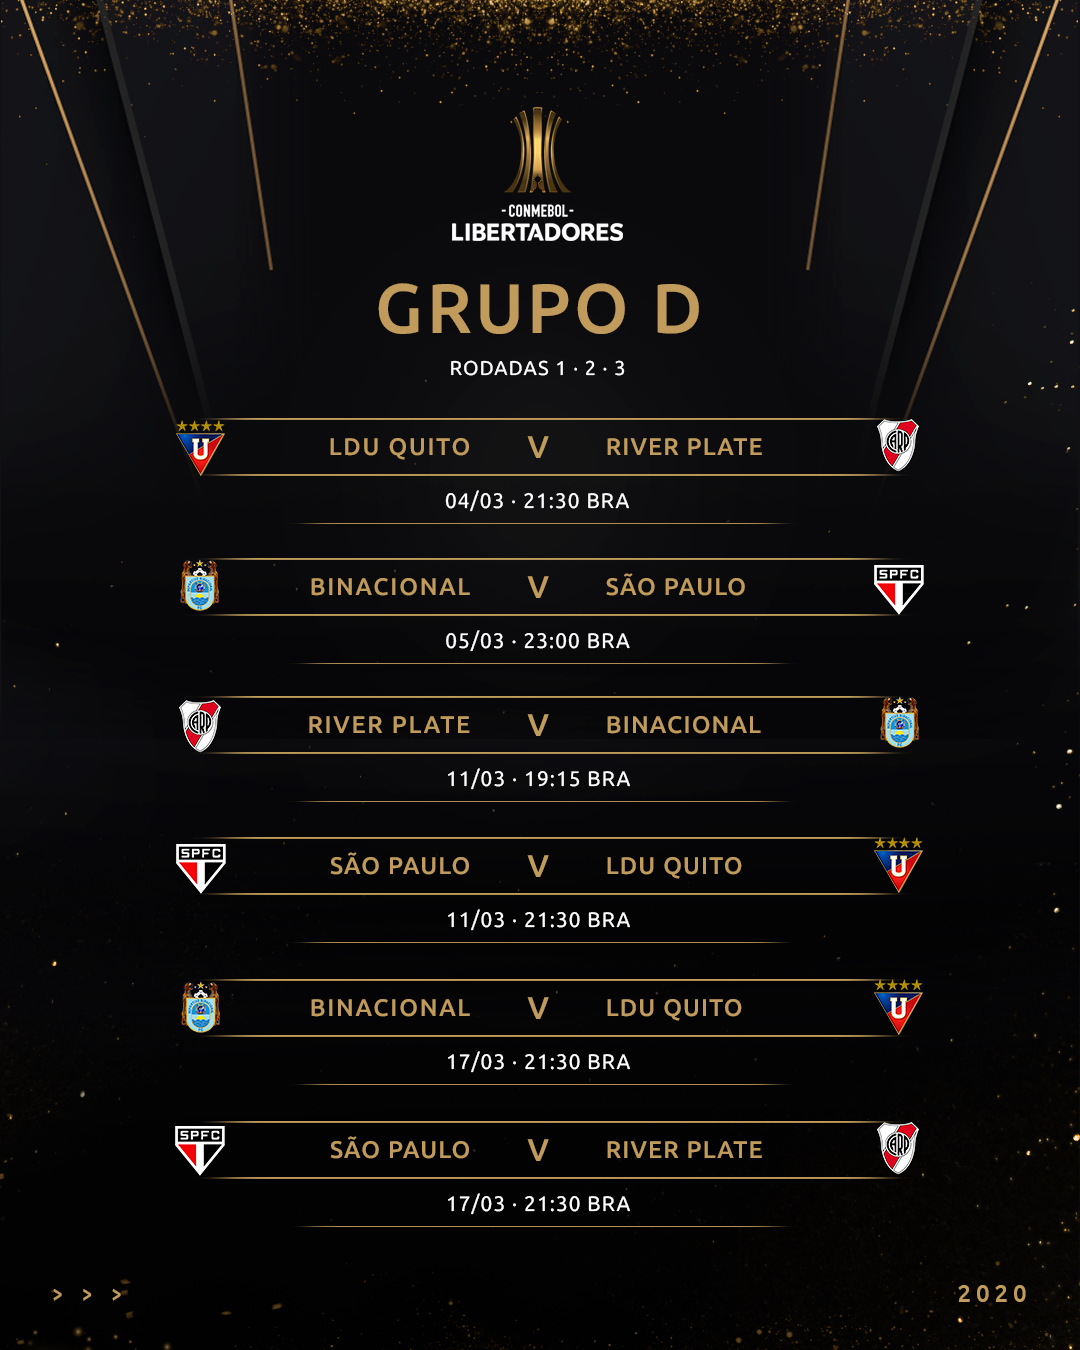 Grupo D - Libertadores - tabela 1